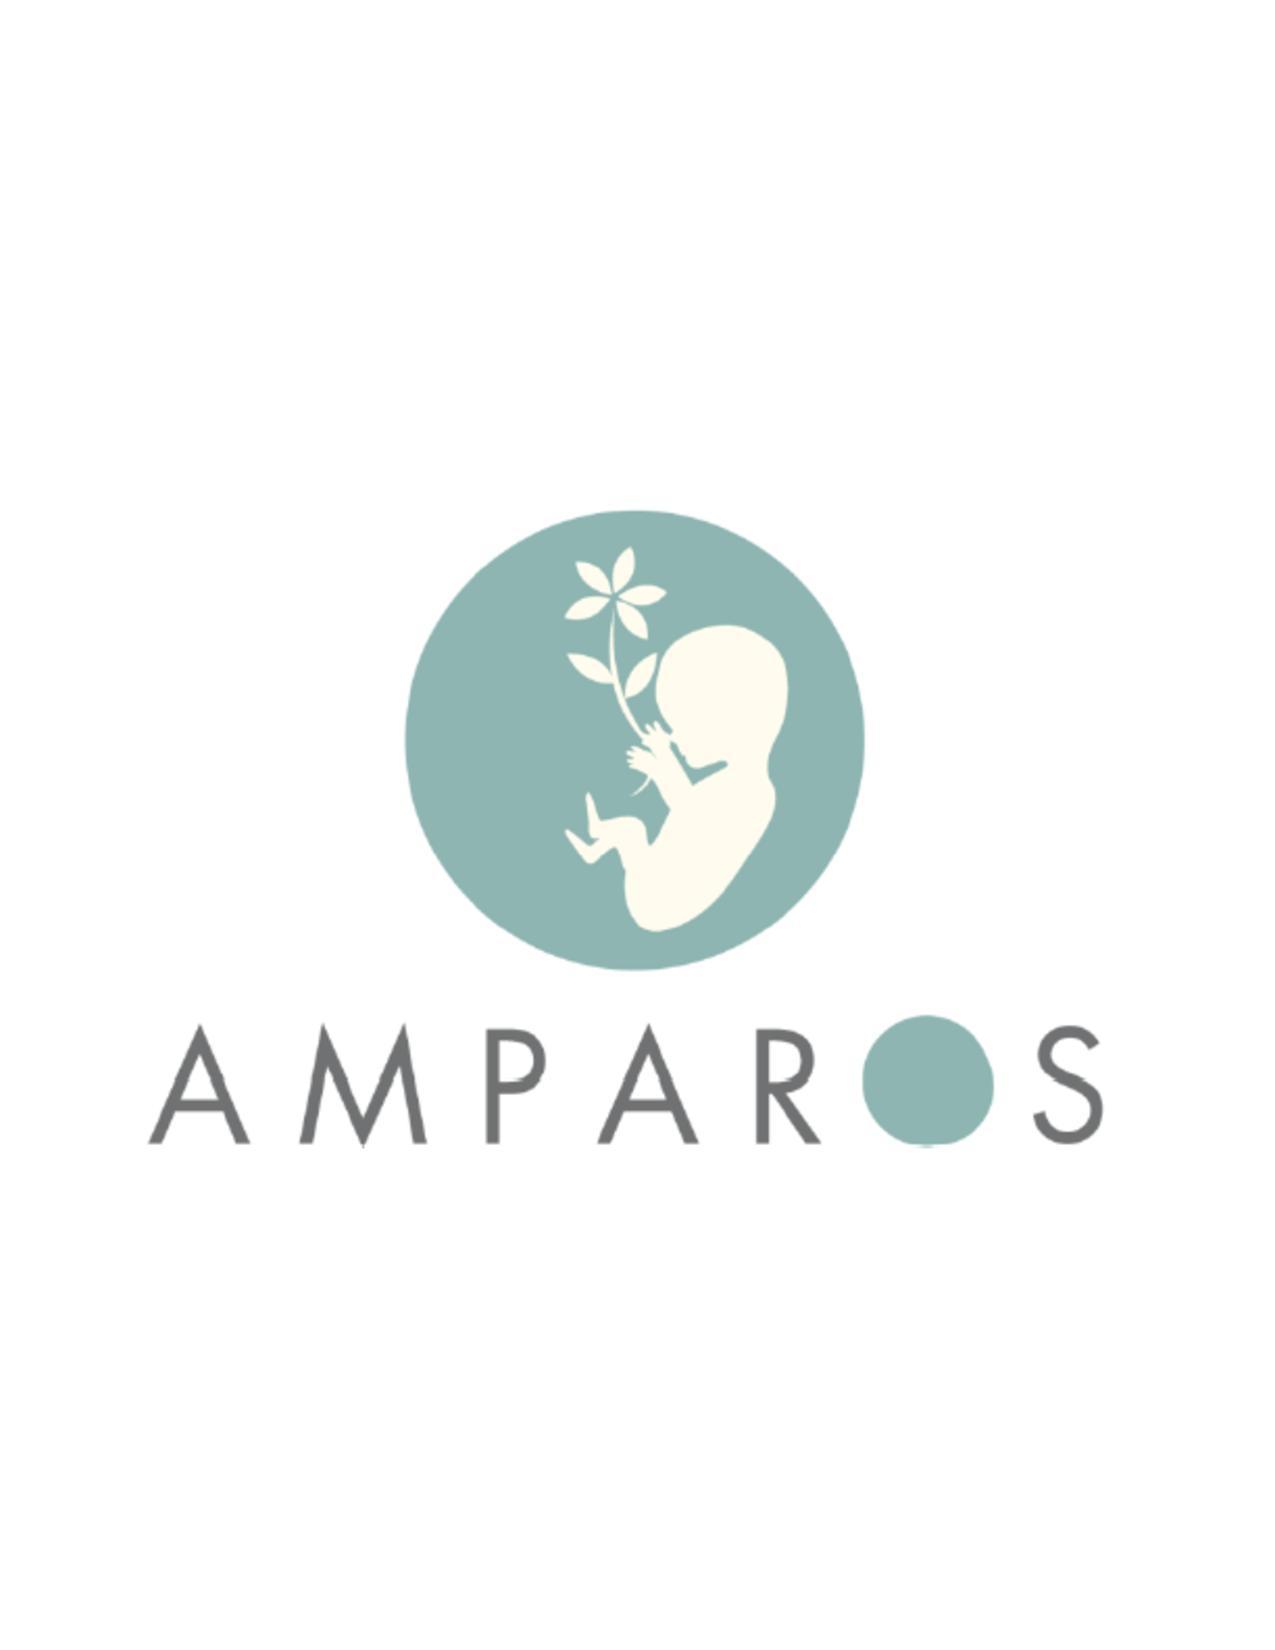 Logo of Amparos